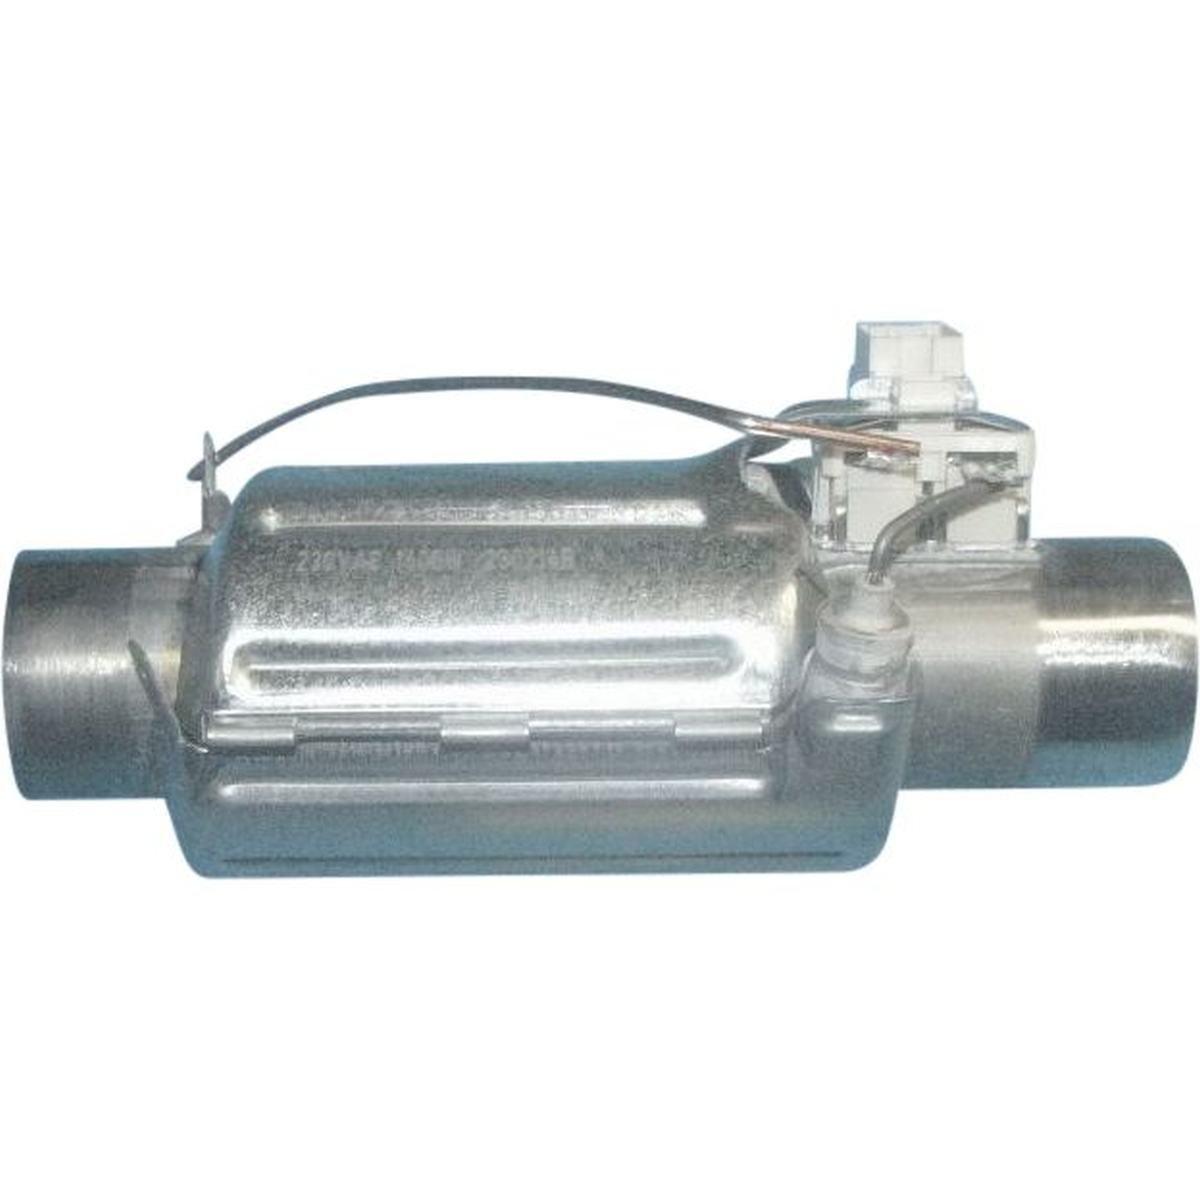 Värmeelement 1600W 230V